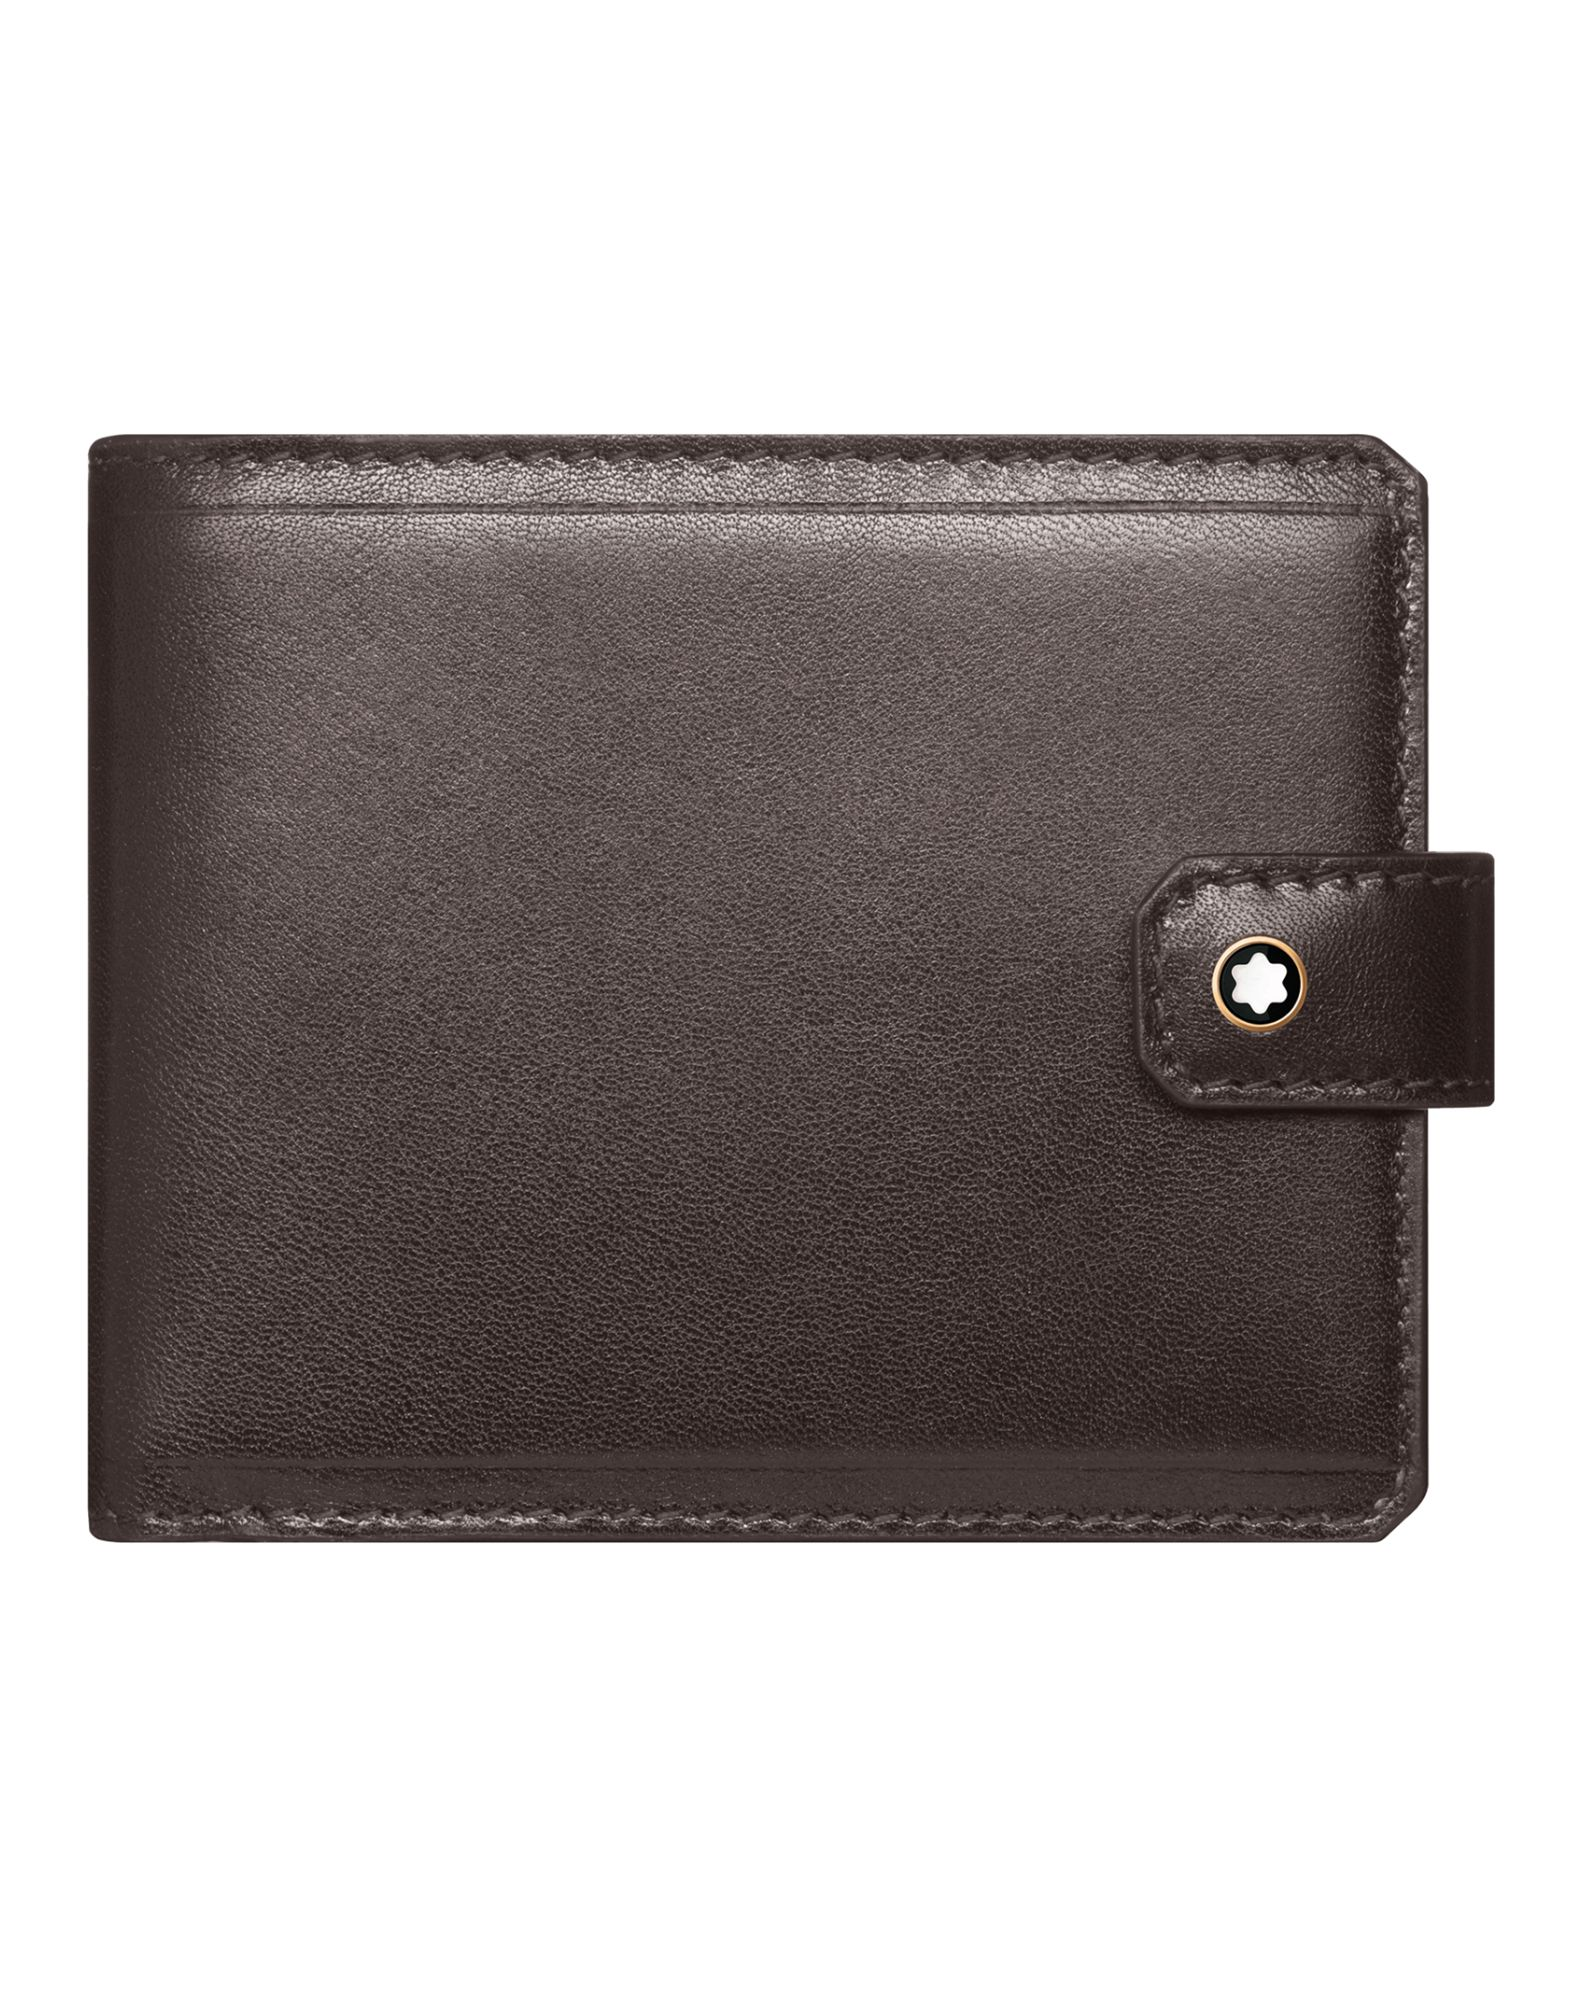 Portafoglio Montblanc 1926 Mb Heritage Wallet 6Cc Dark Brown - Uomo - Acquista online su